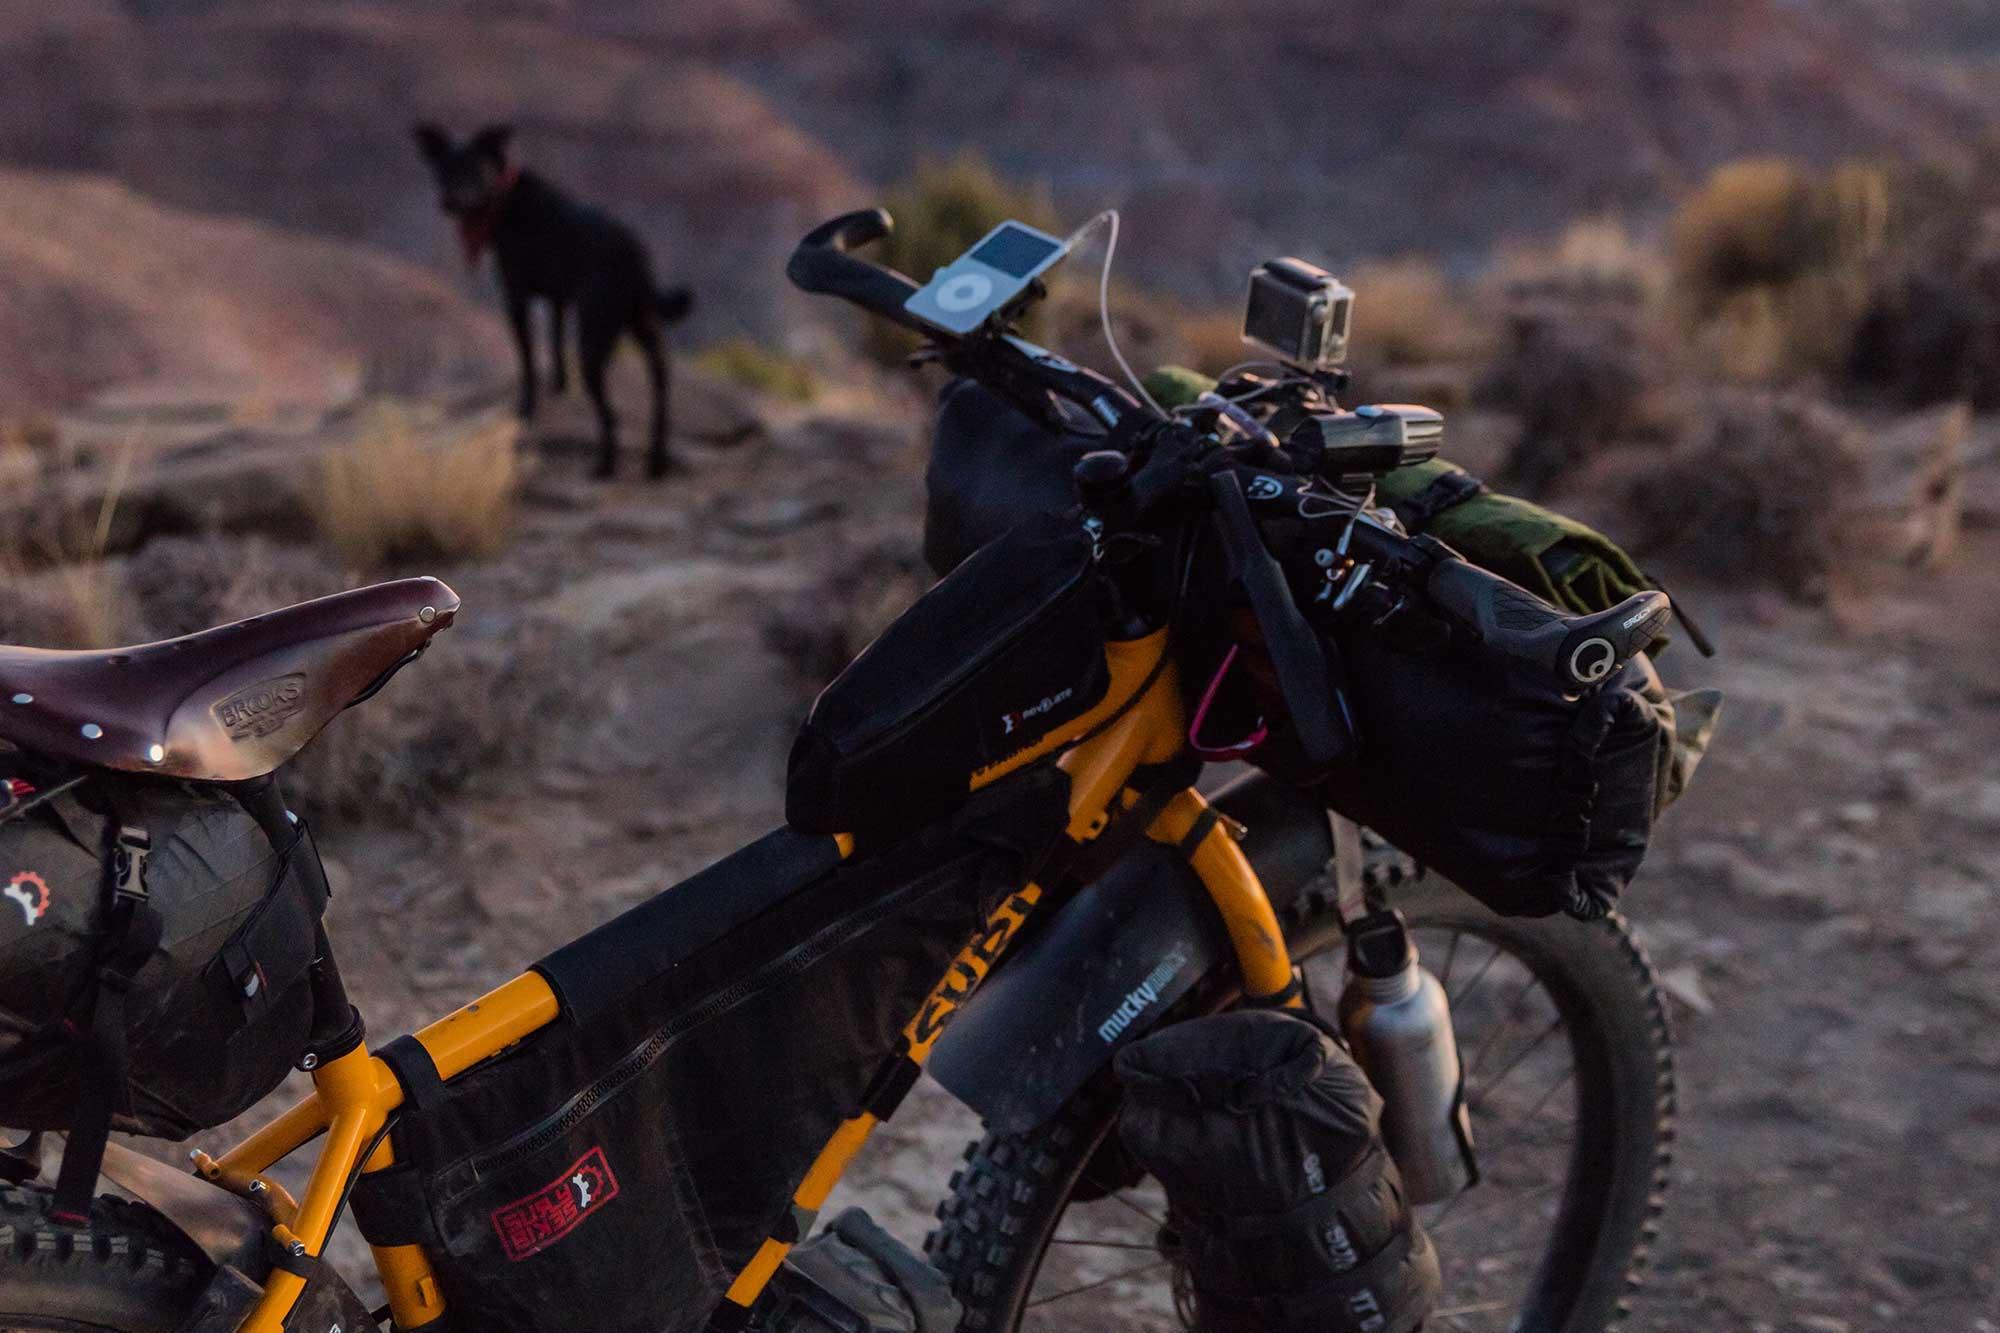 Bikepacking adventure with dog